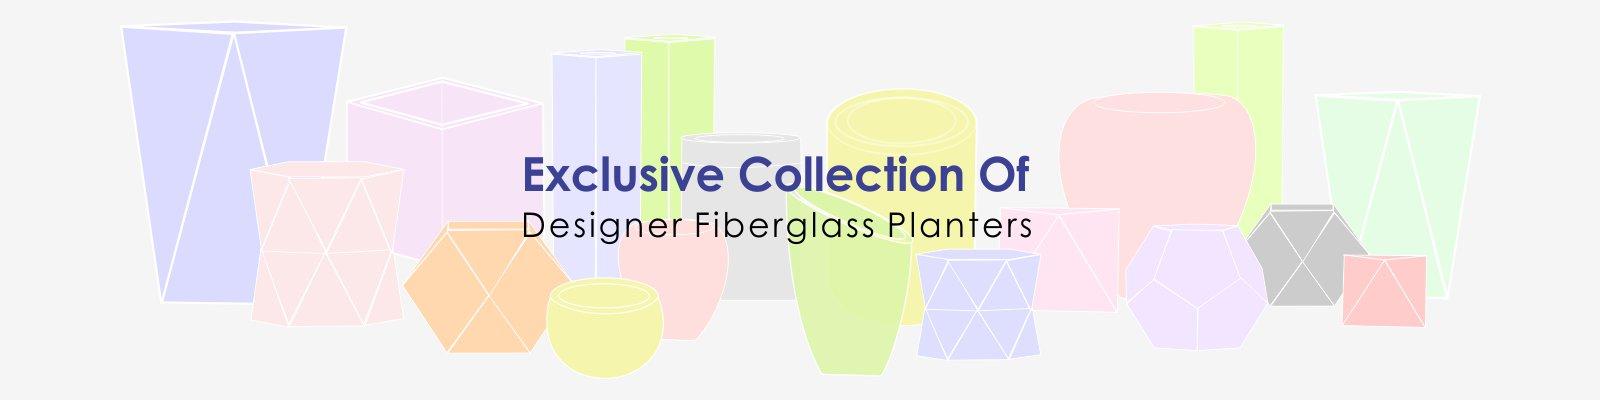 FRP Planters - Fiber Glass Planters - Polystone Planters - Gurgaon, Delhi, Noida, India